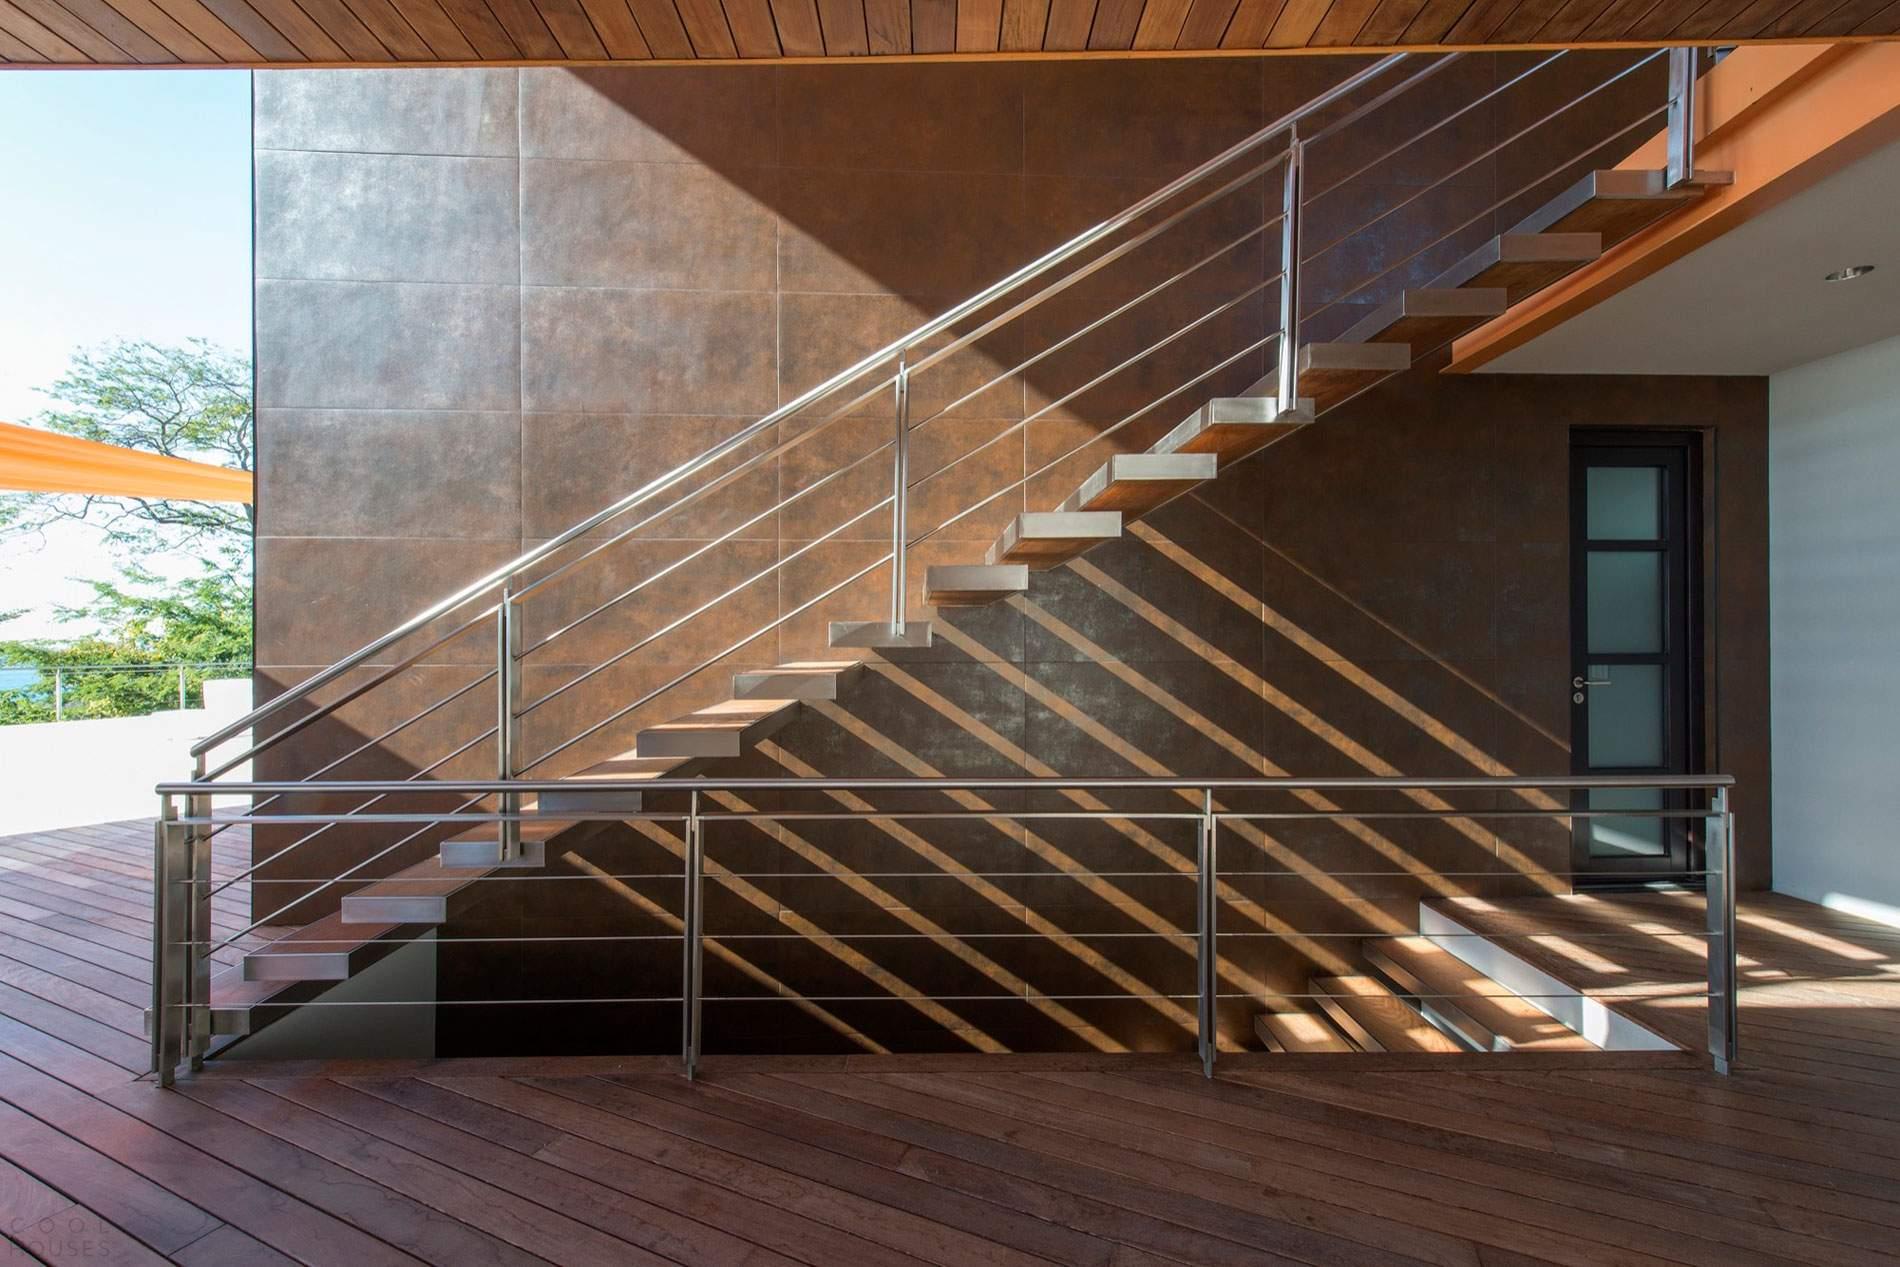 Роскошная резиденция в стиле модерн в Коста-Рике